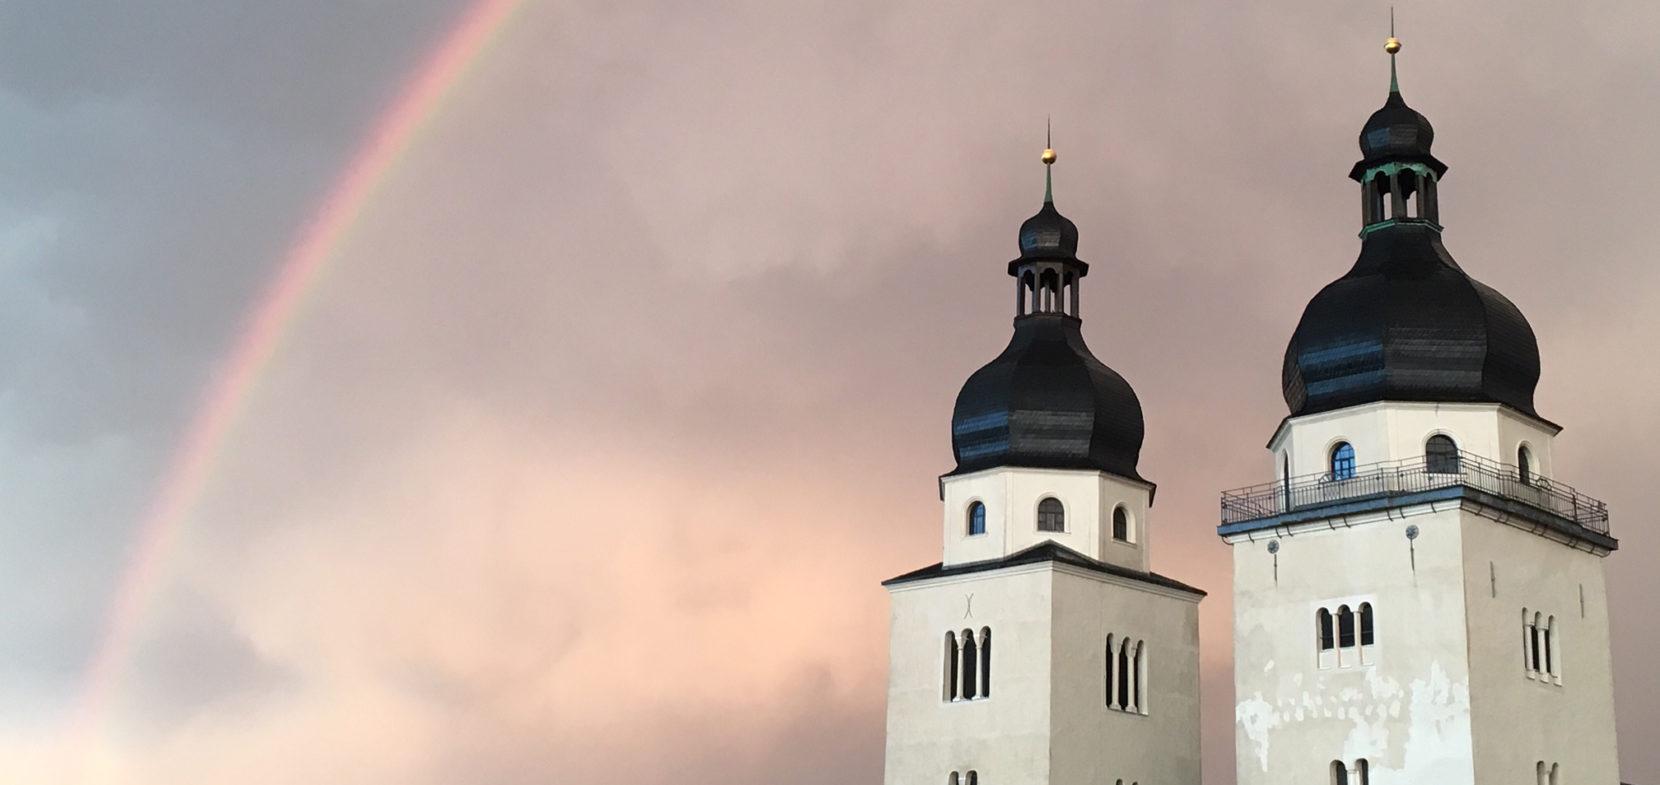 Kirchenbezirk Vogtland